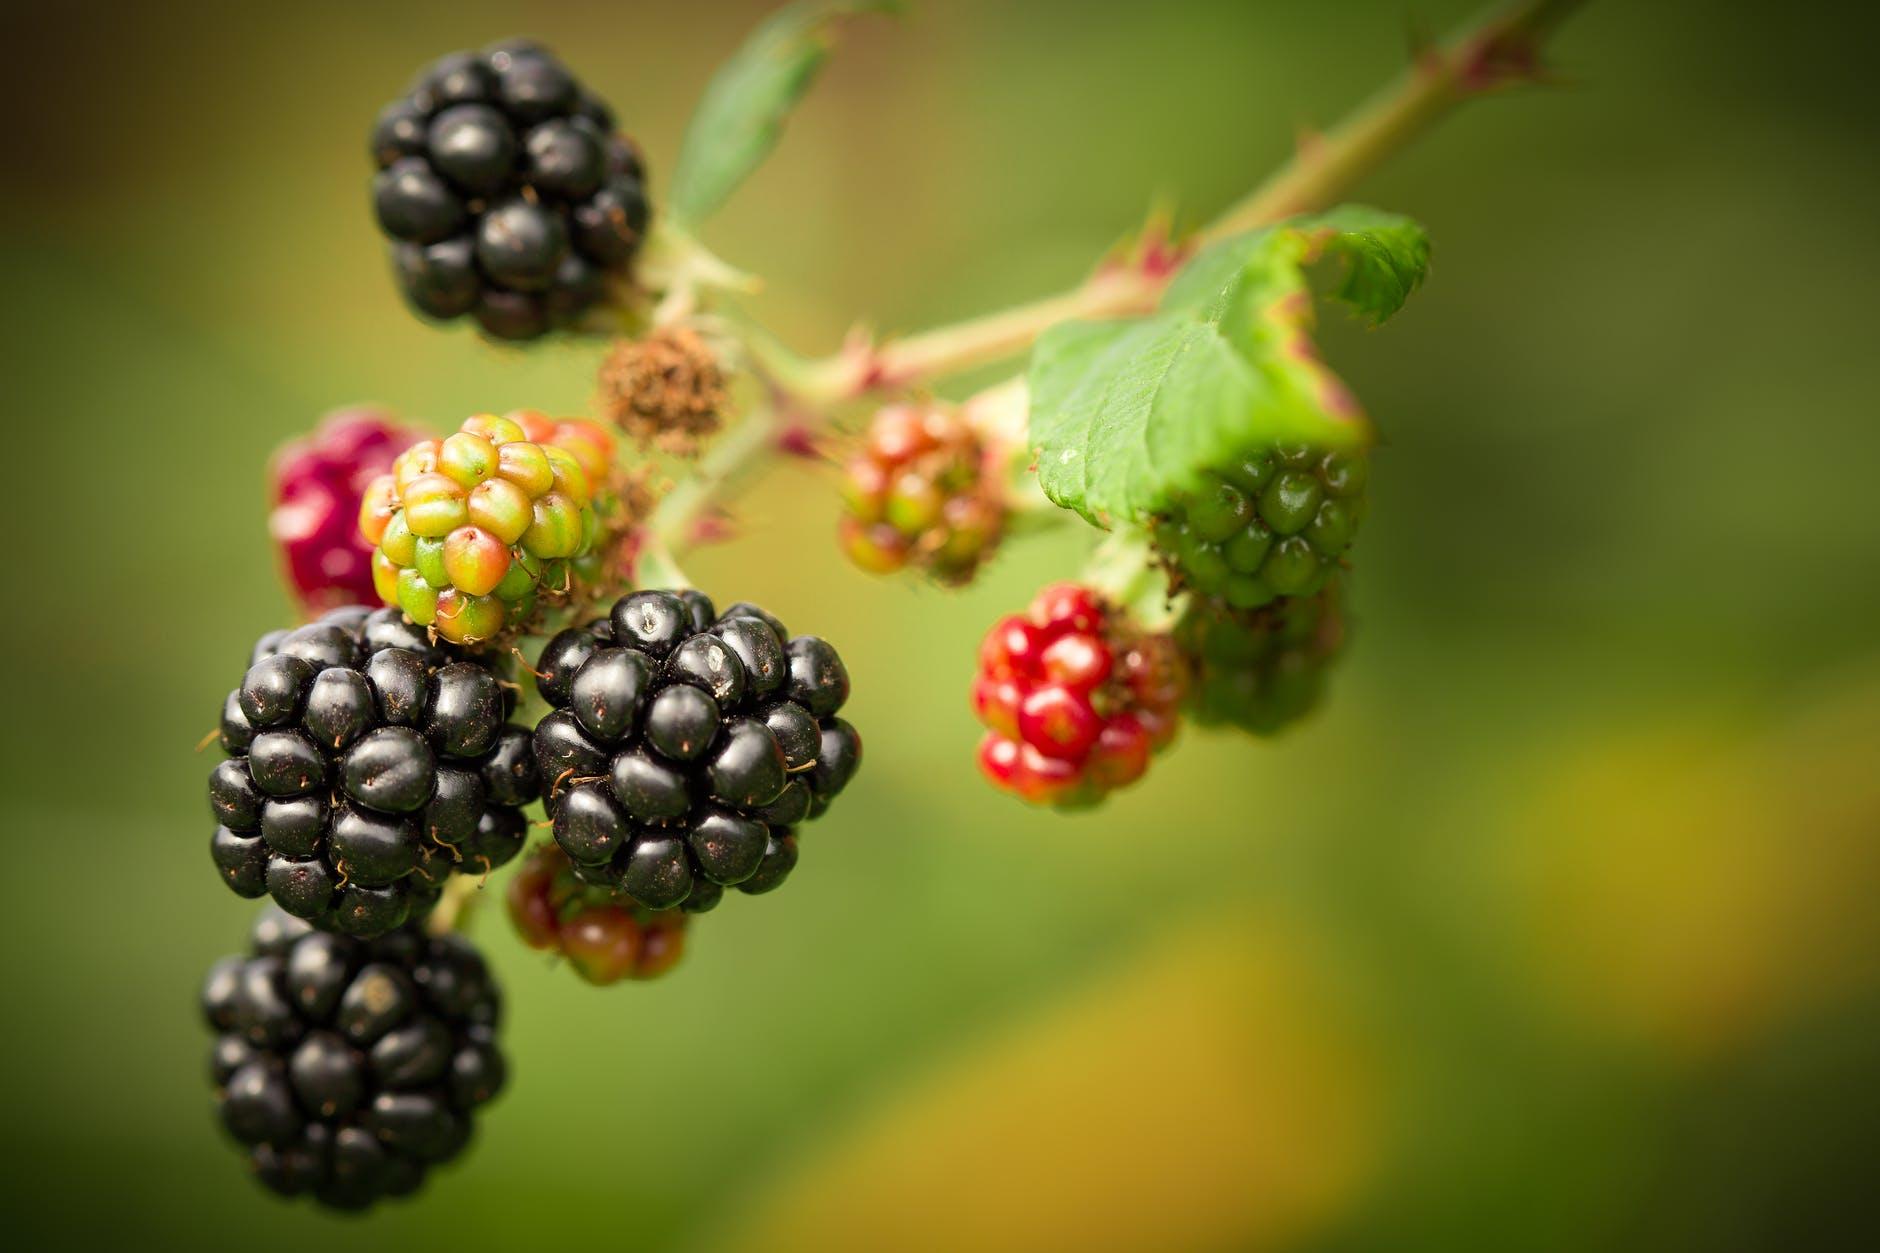 Blackberries on a bramble